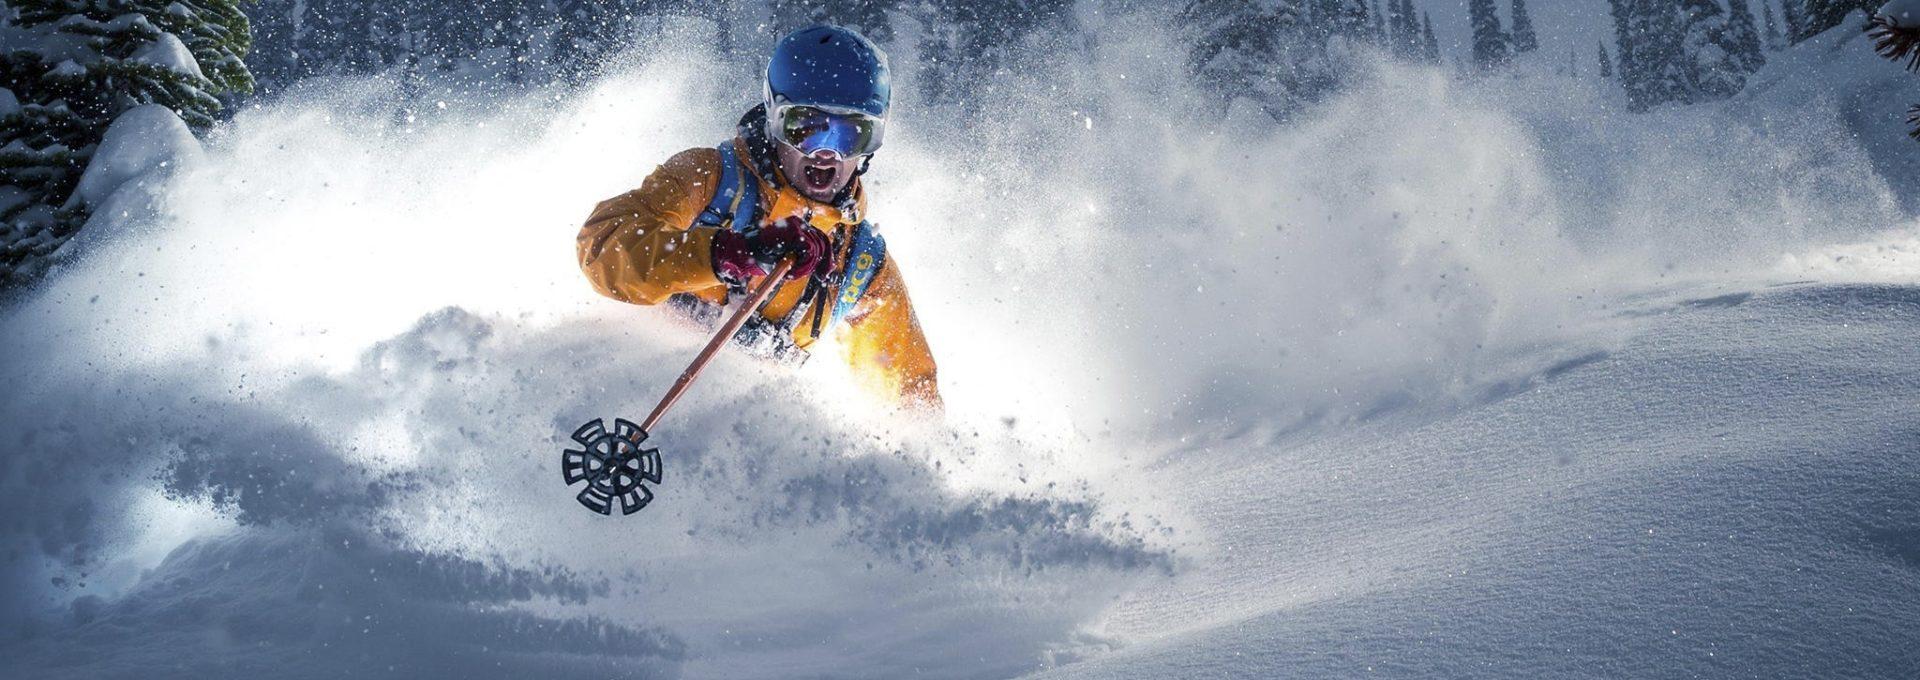 Sydney滑雪探險家